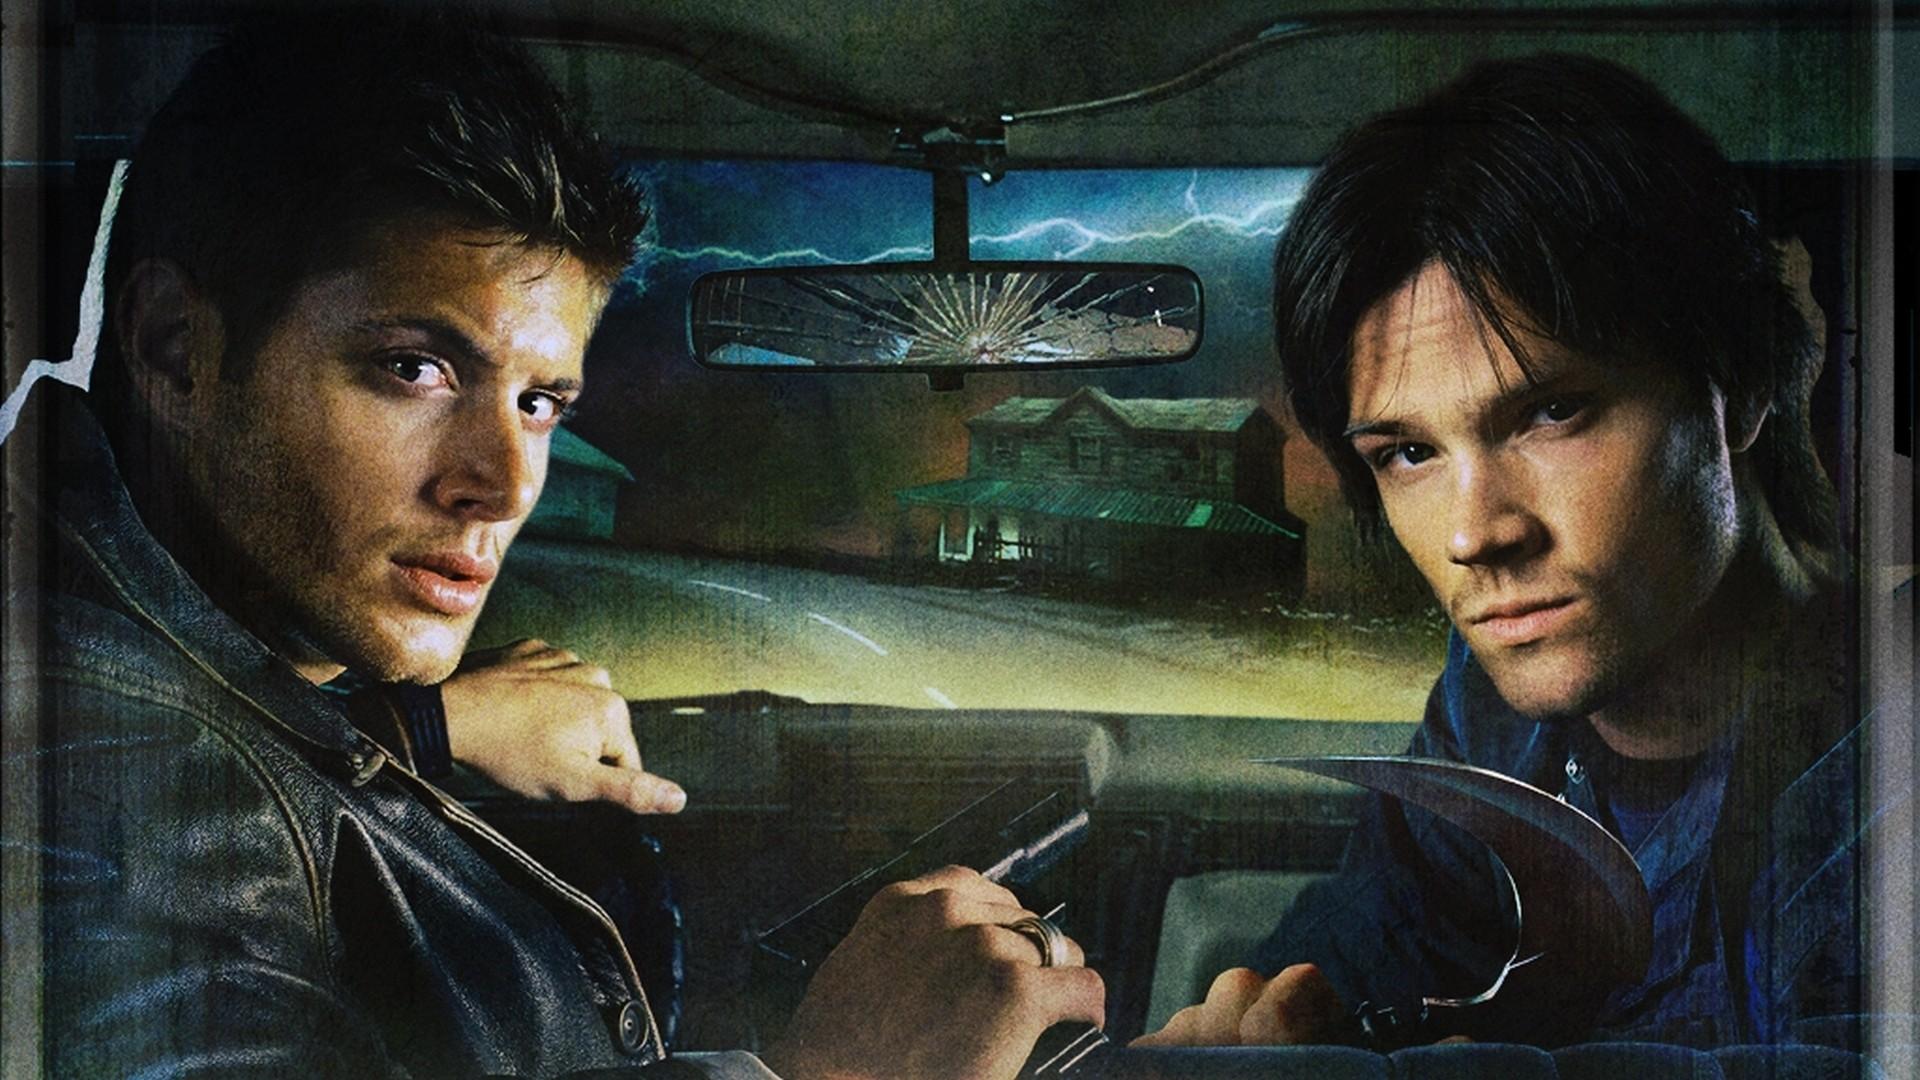 Jared Padalecki cottage Supernatural TV series wallpaper background 1920x1080